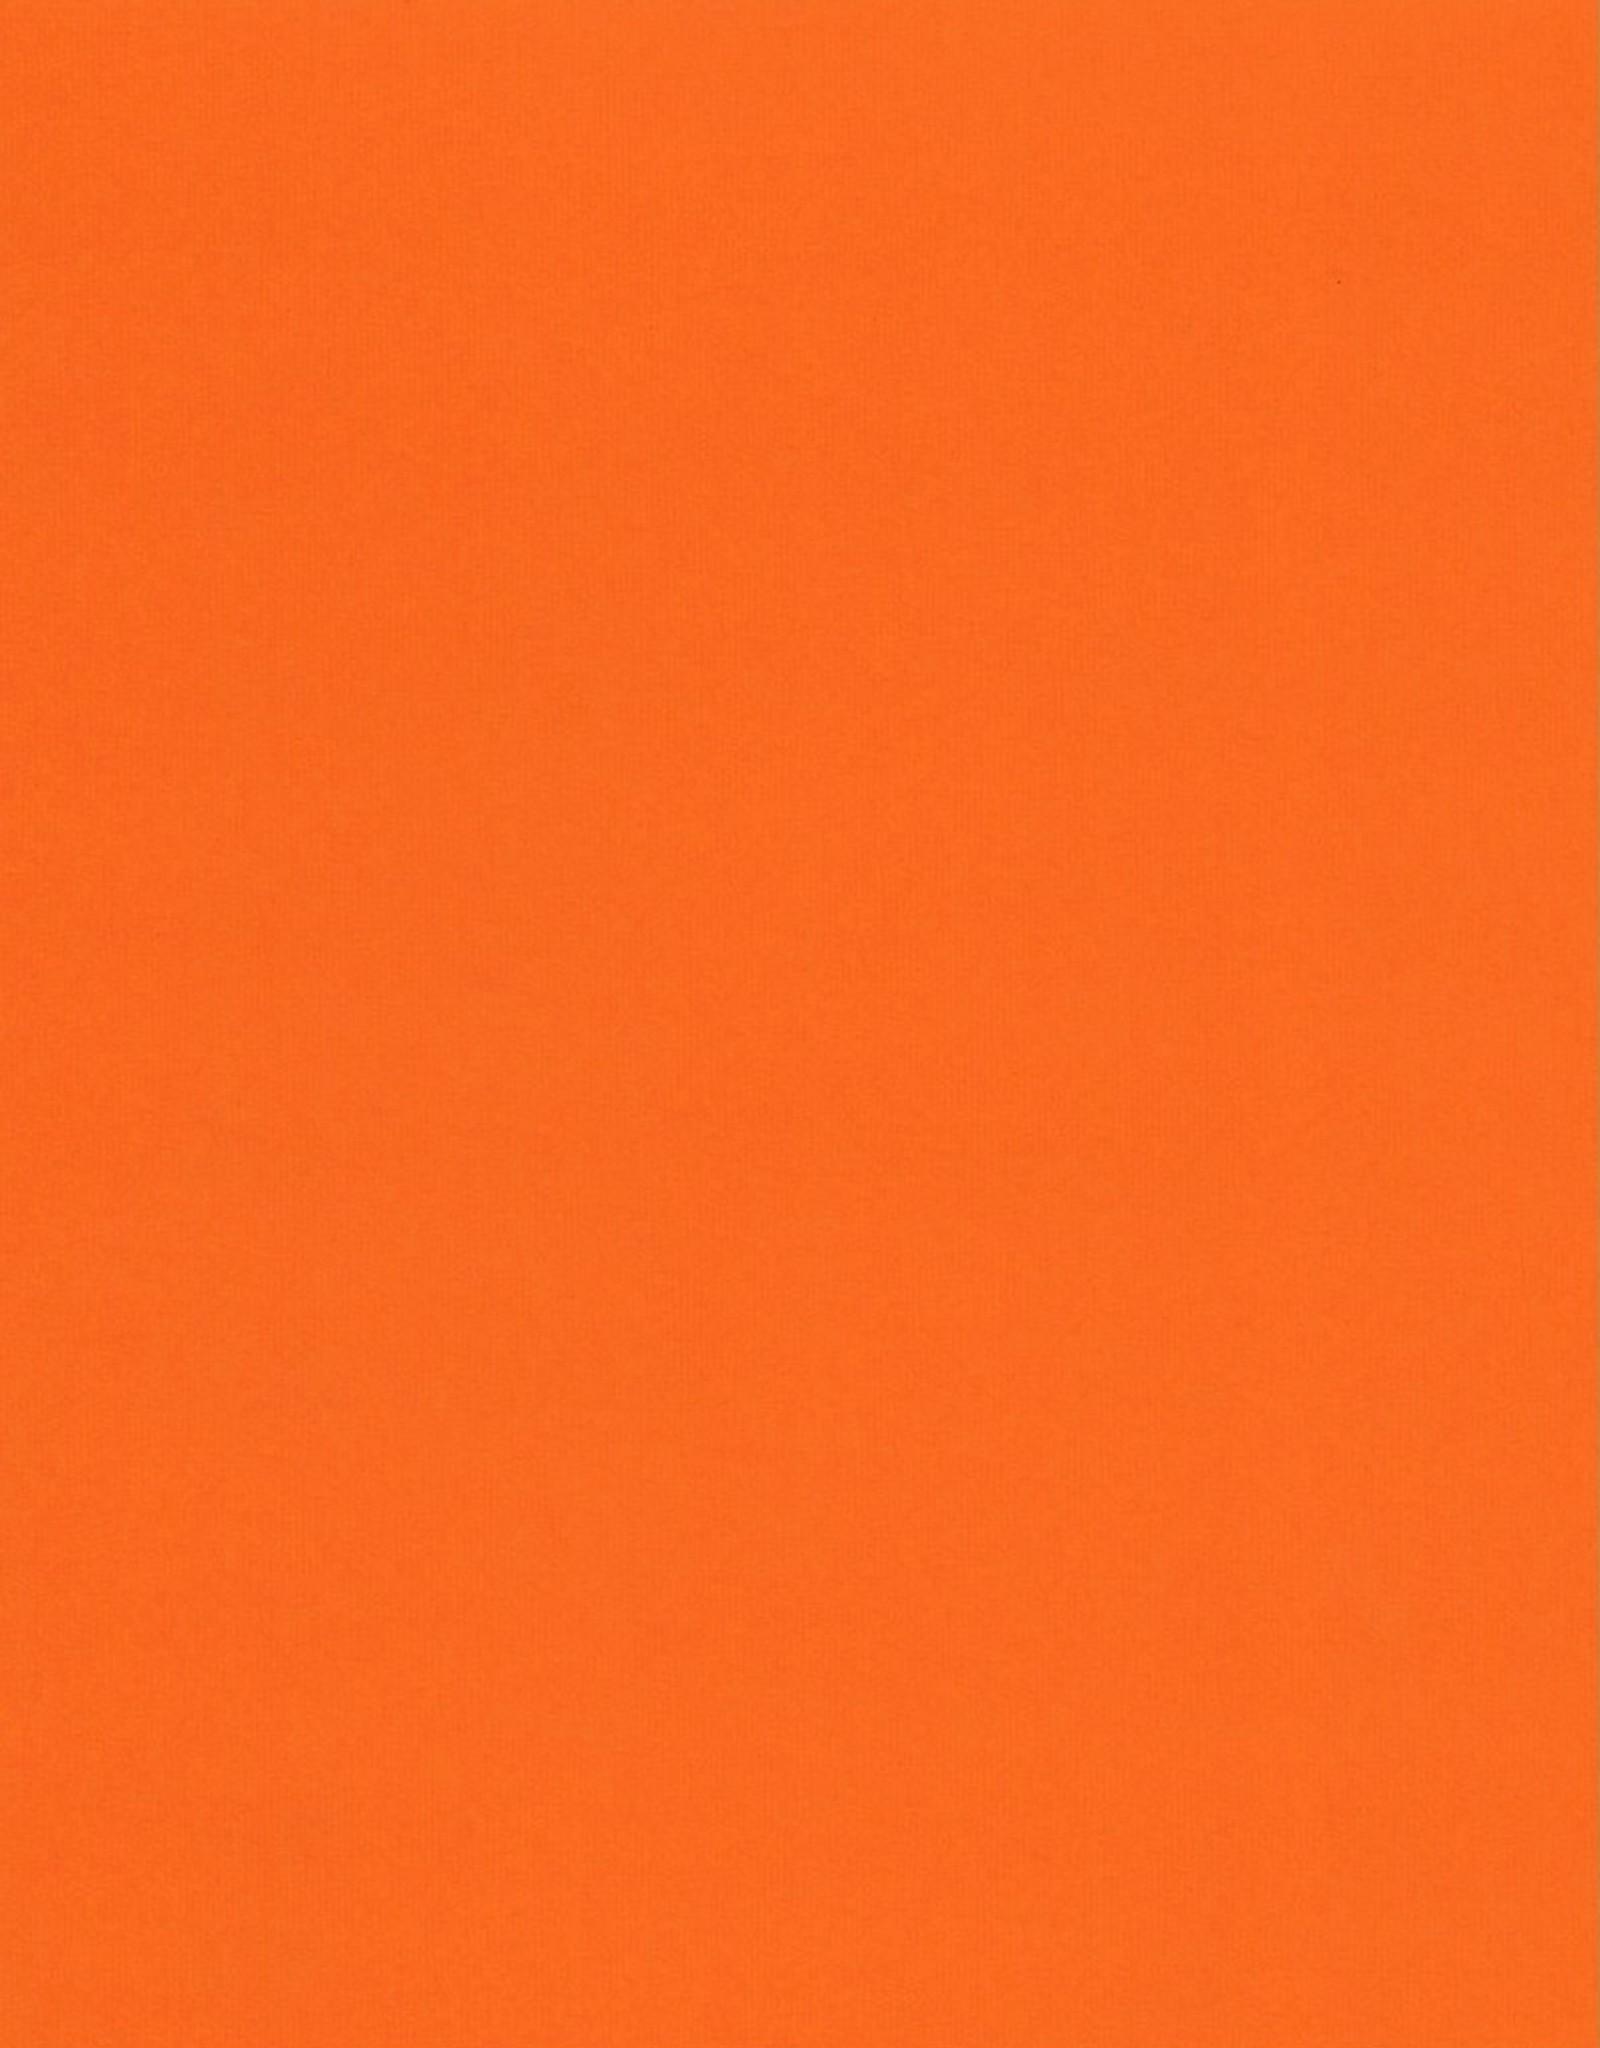 "Fabriano Vice Versa (Elle Erre), Light Orange, 20"" x 27.5"", 220gsm / 135#"